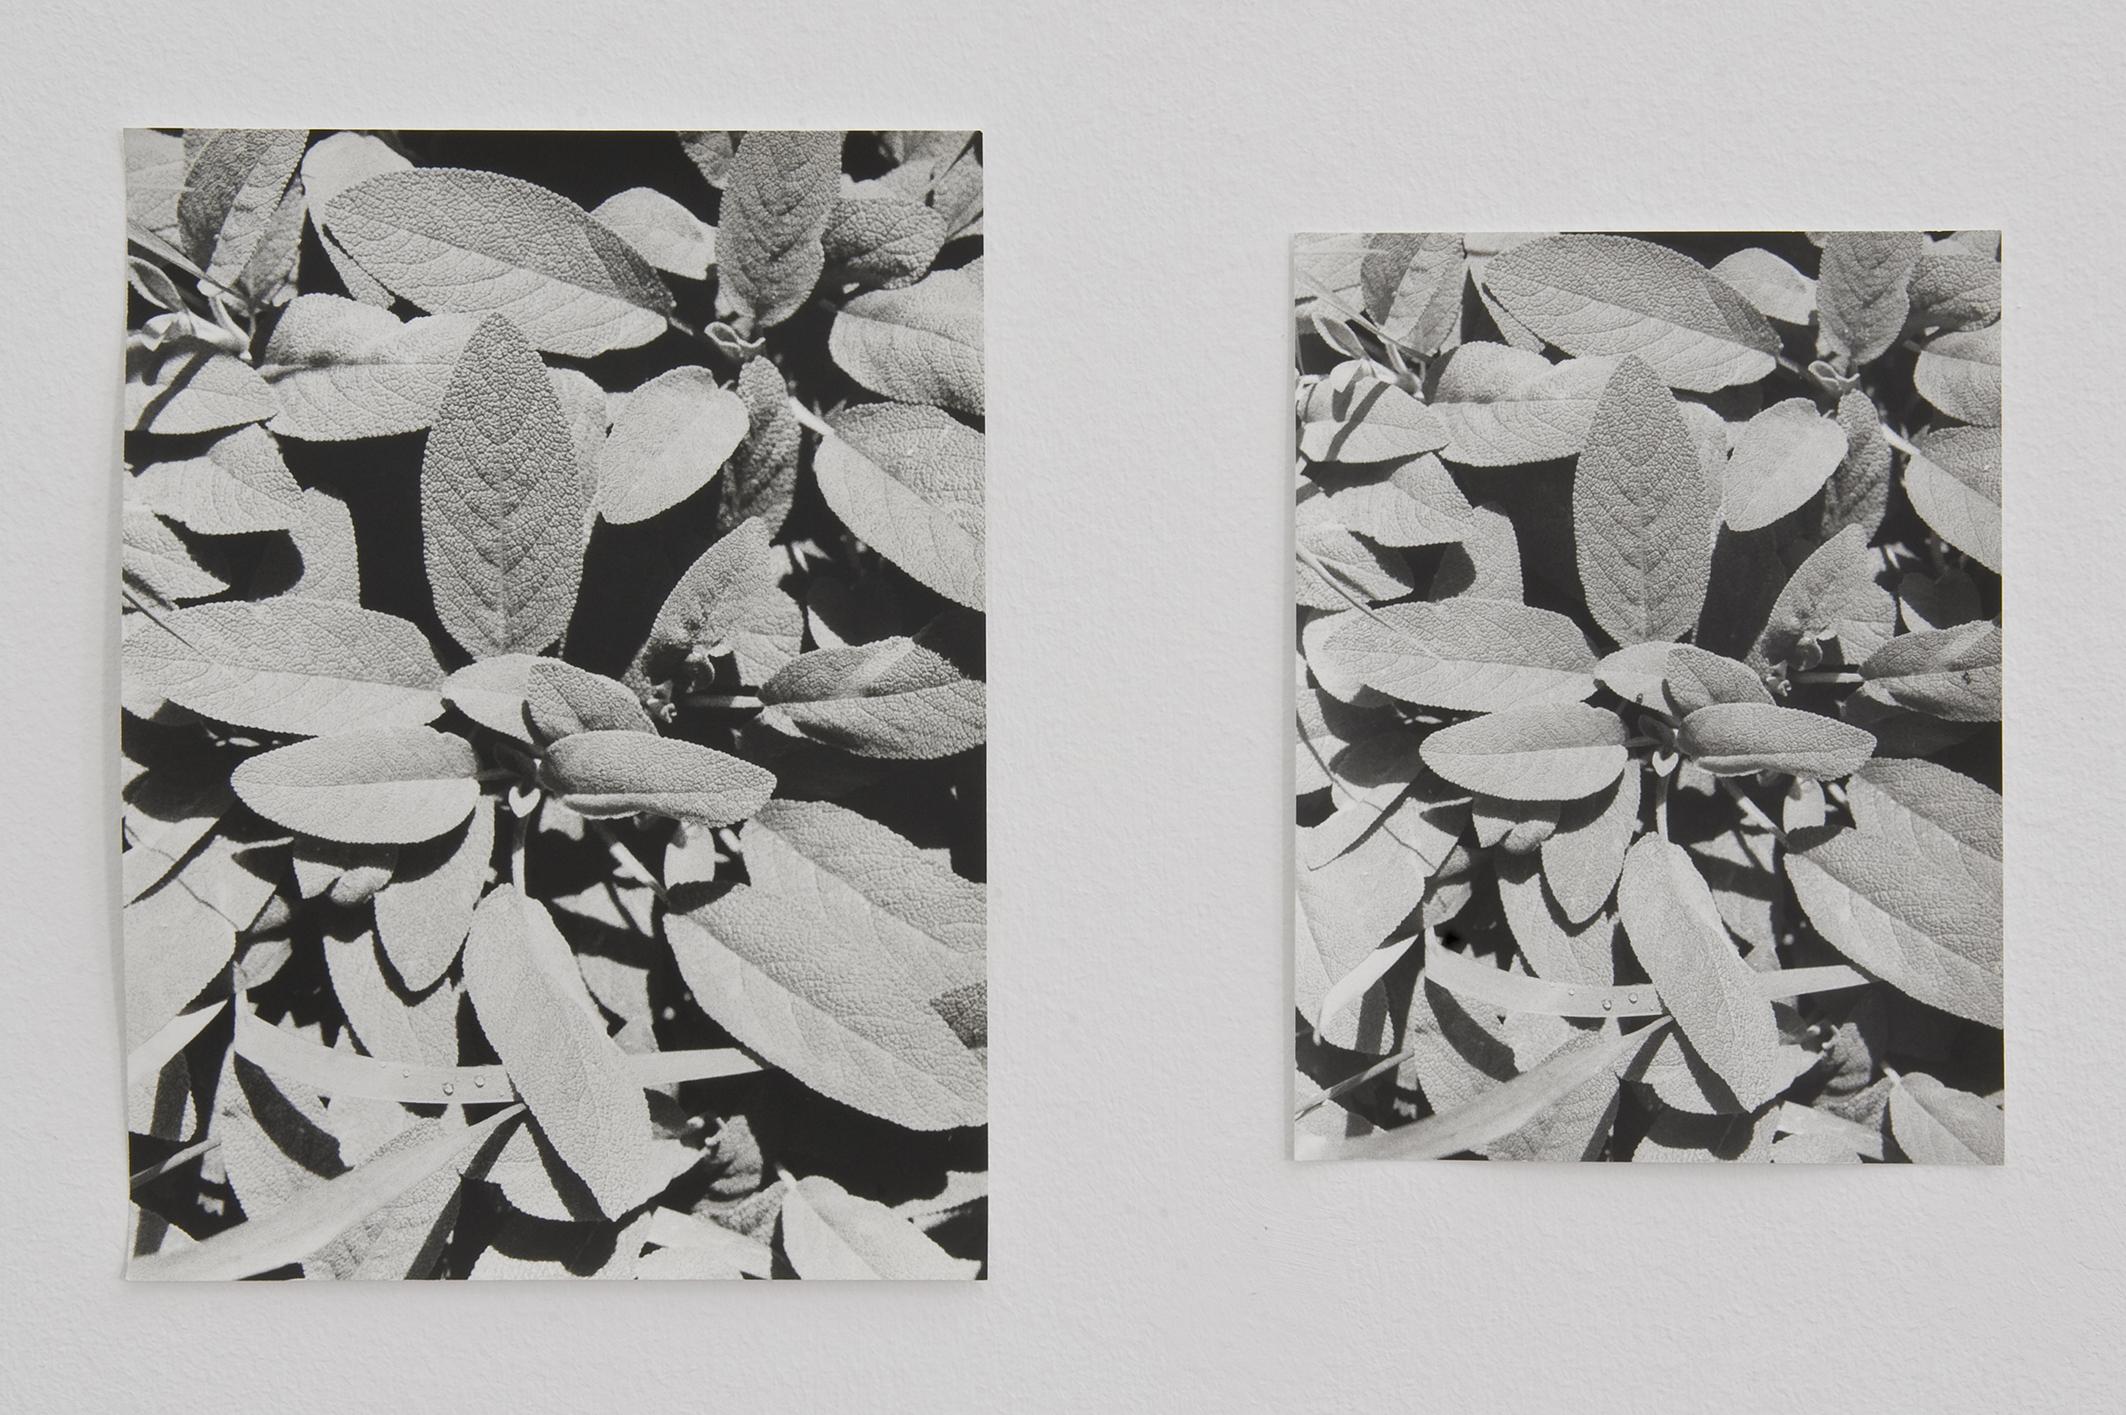 Salvia, 2013 – 2014 | Jochen Lempert | ProjecteSD